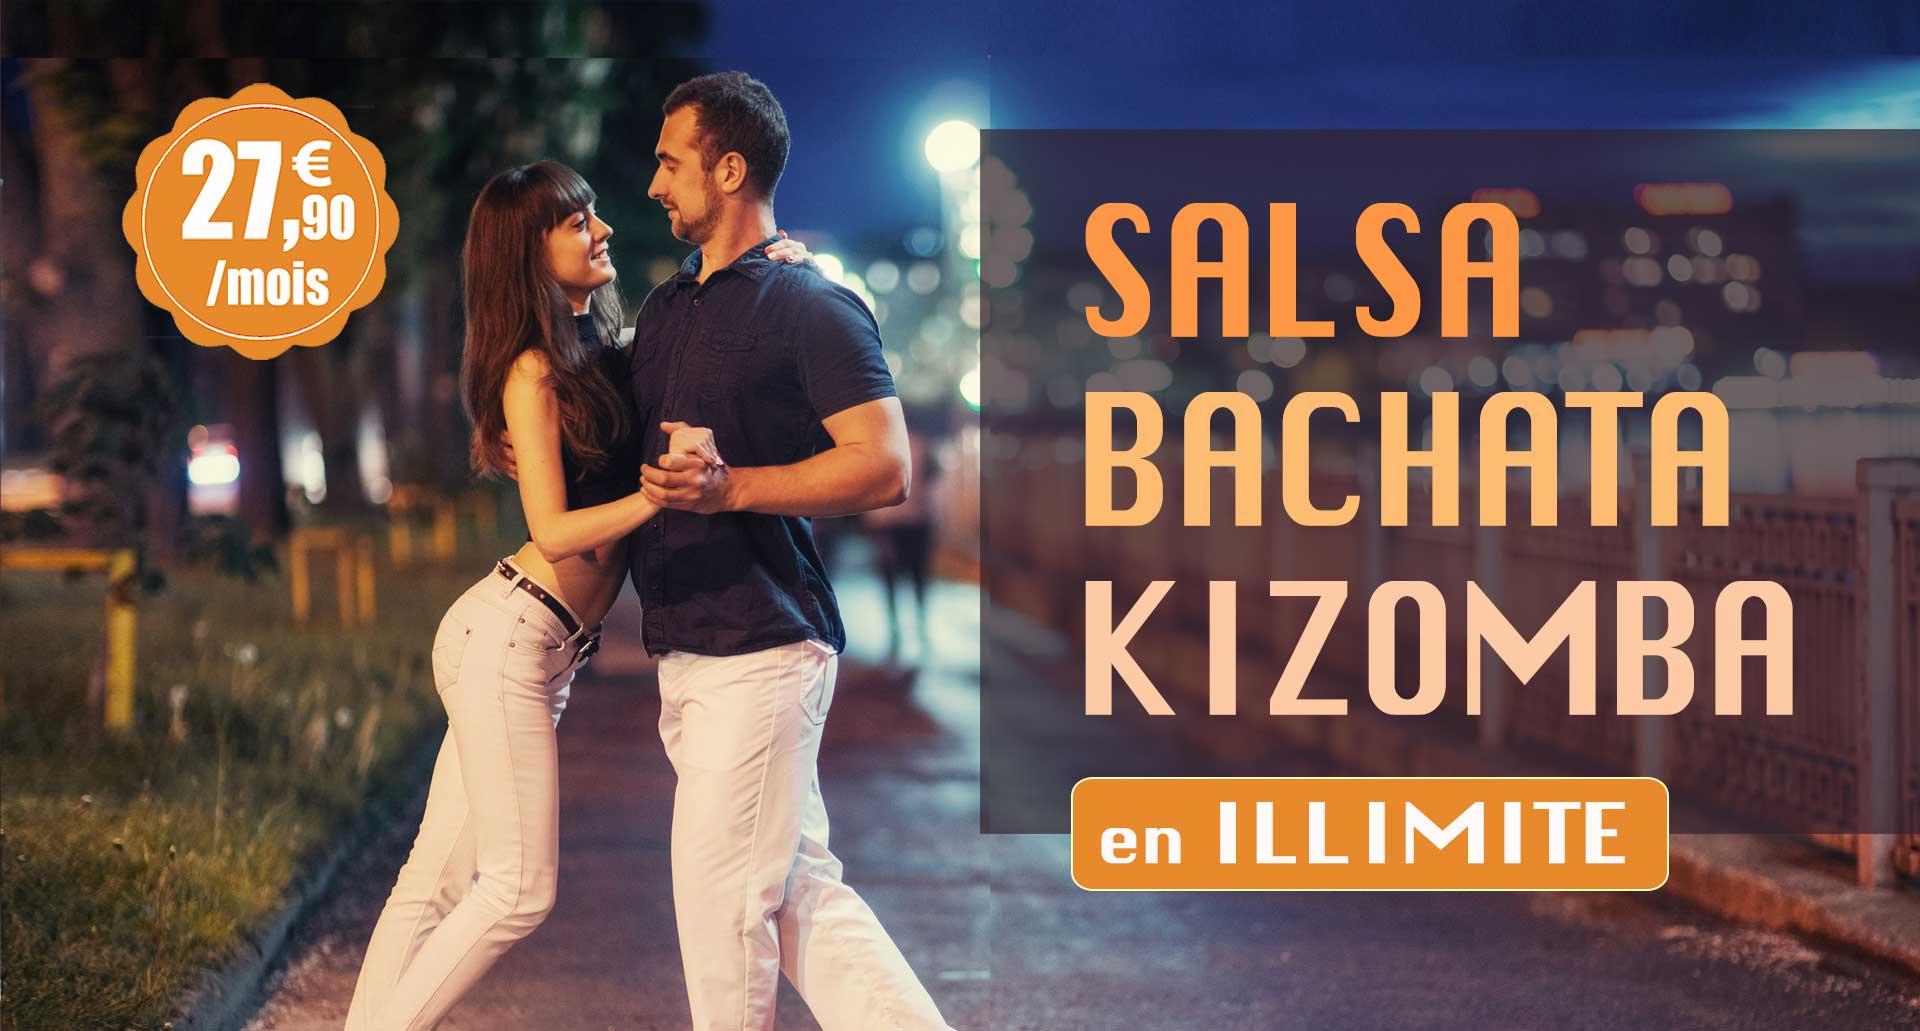 Ecole de danse Montpellier, Cours salsa bachata kizomba Latin danse